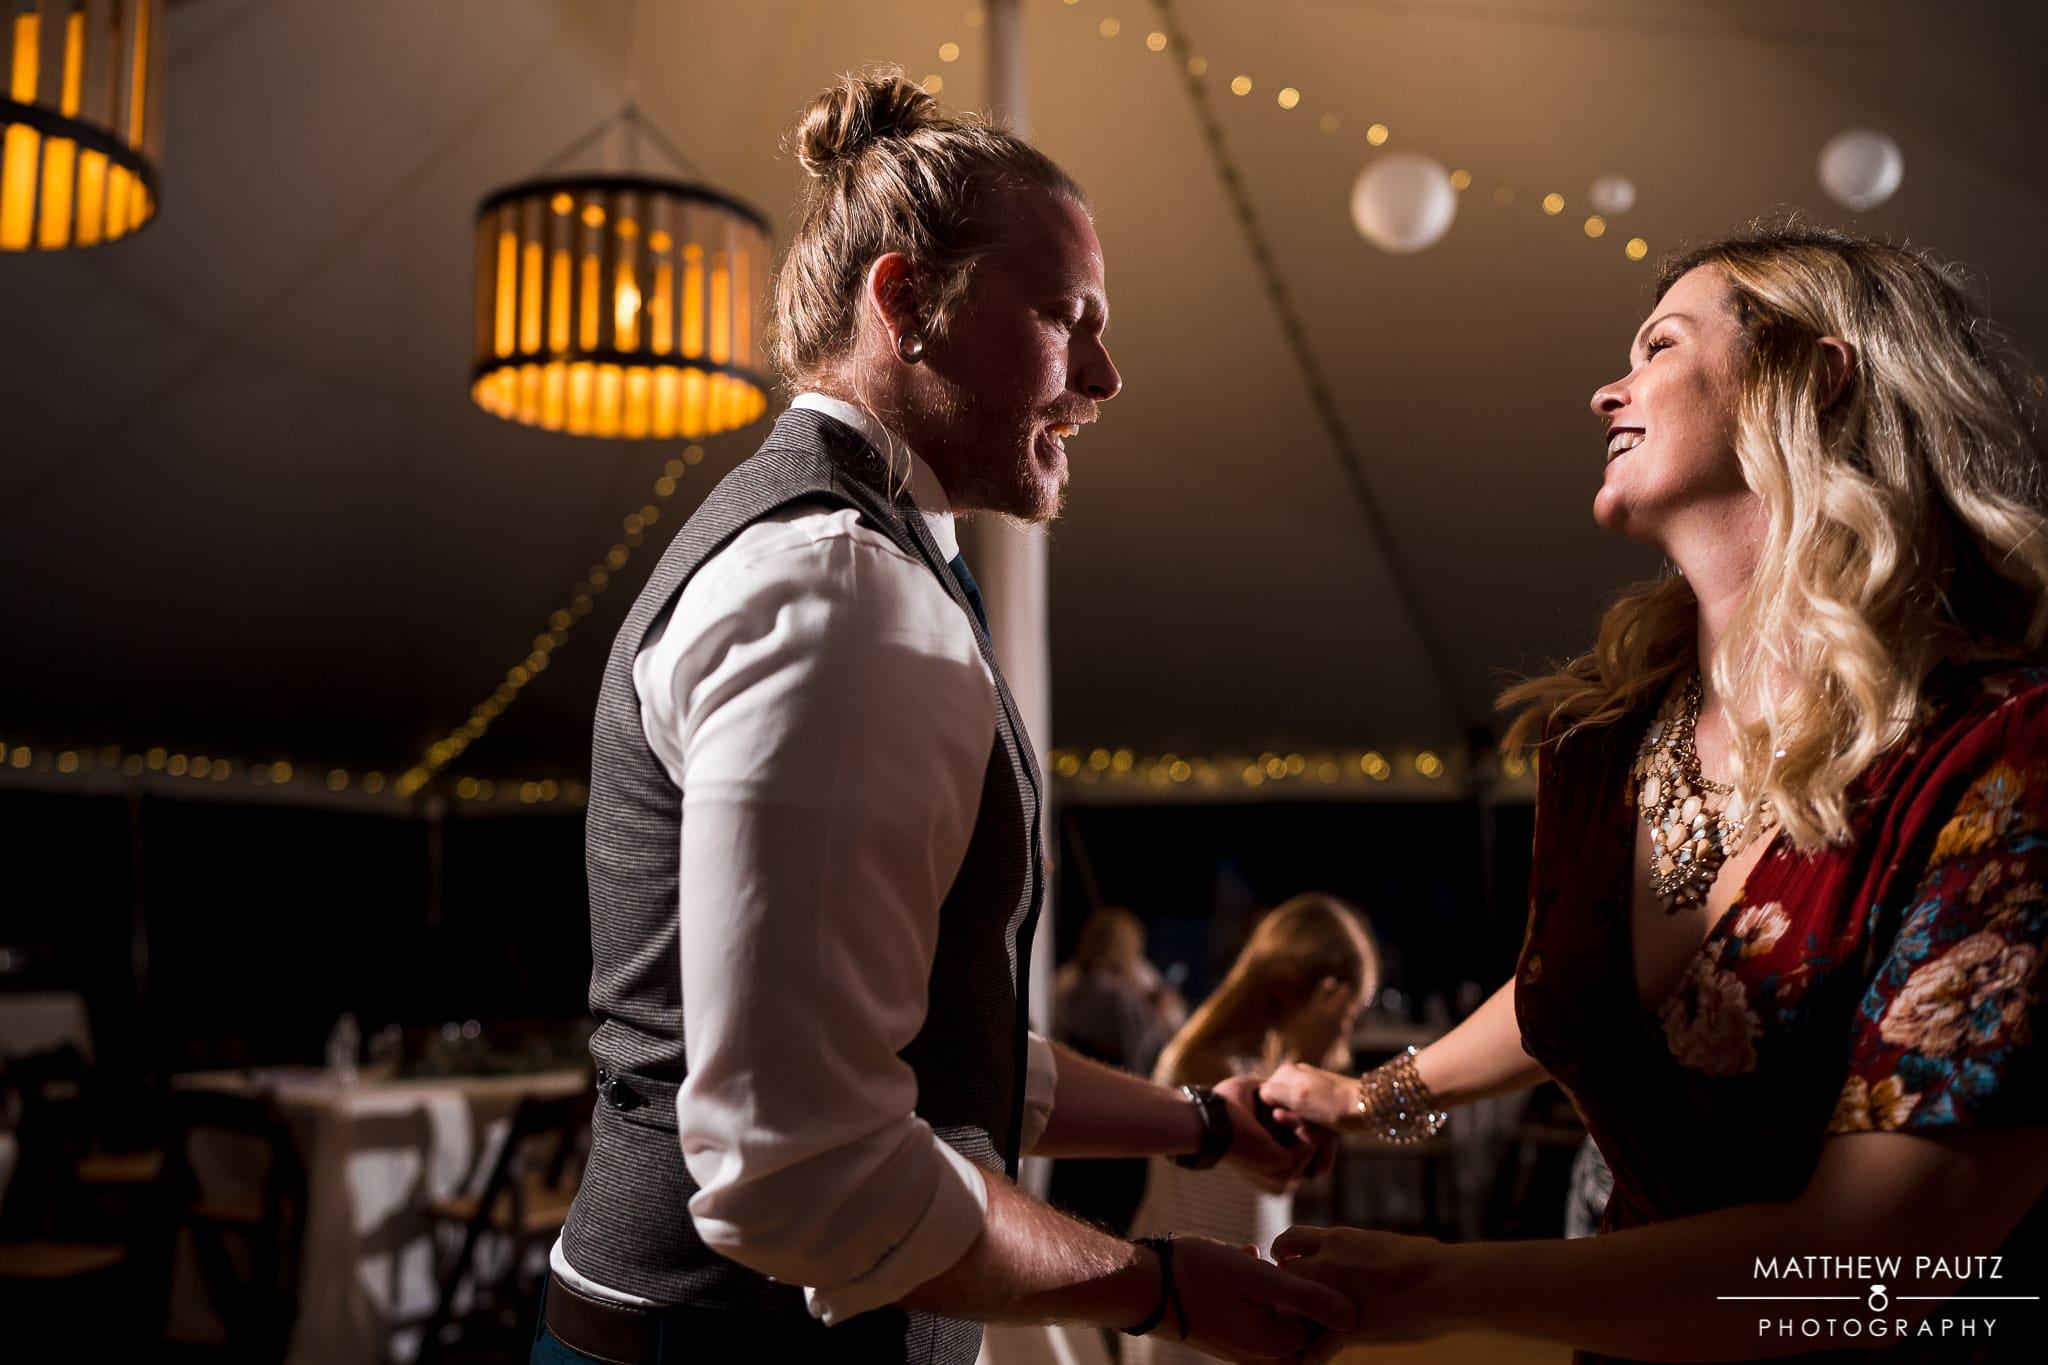 wedding guests having fun and dancing at wedding reception